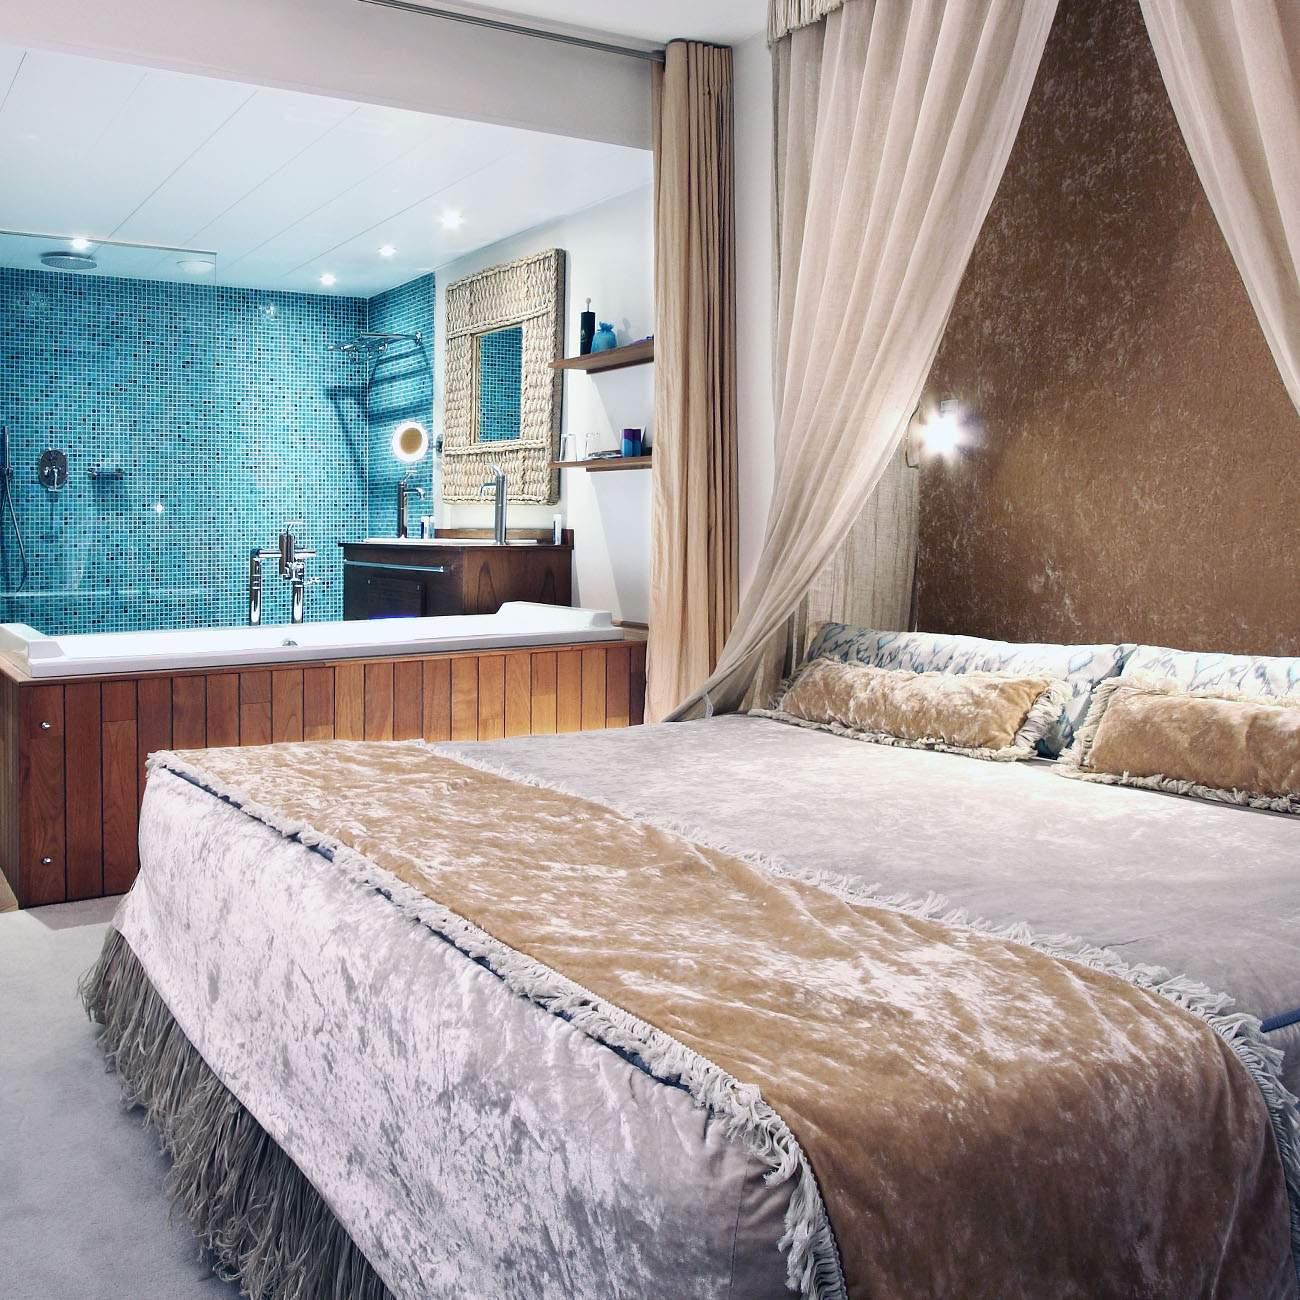 BLOG DESIGN_HOTEL 314_2